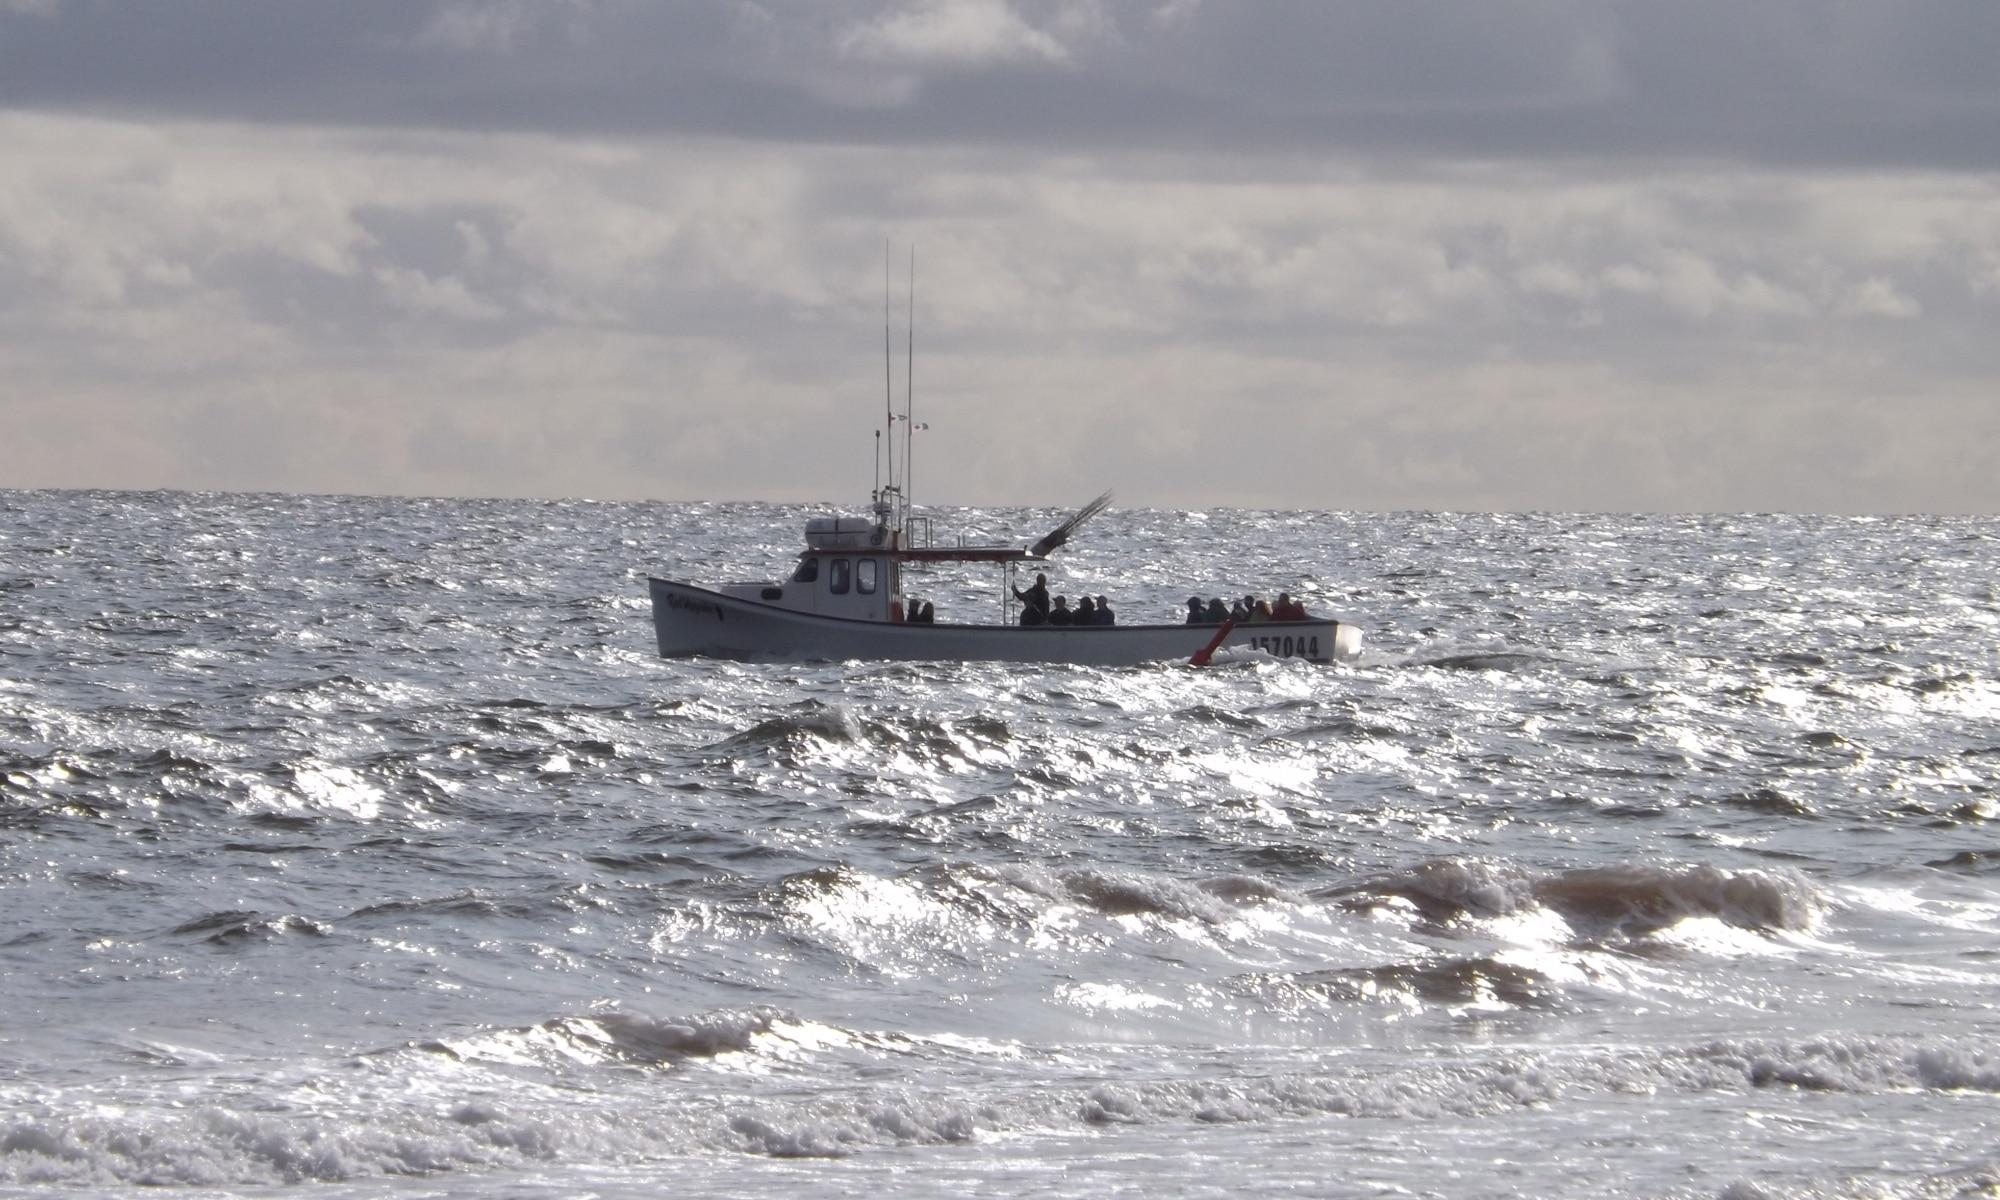 Fishing-Boat-at-North-Rustico-DSCF8383